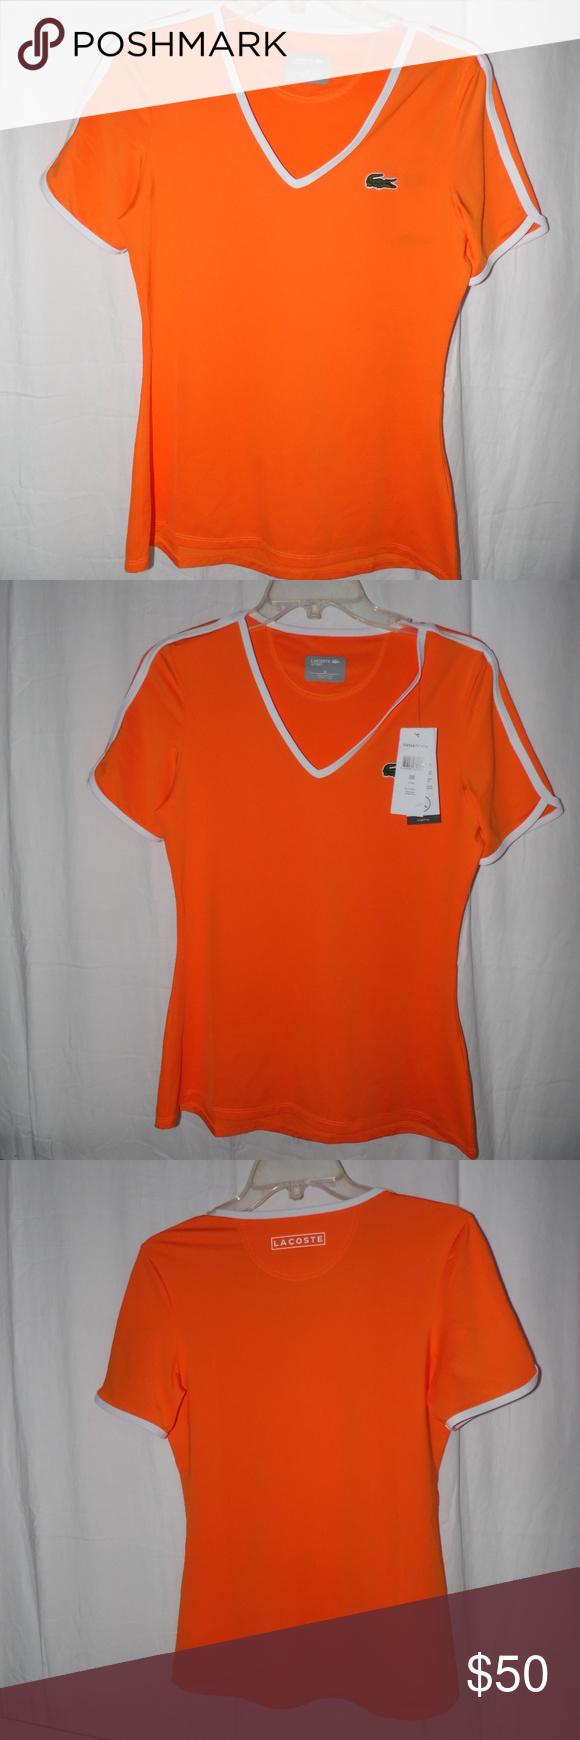 POLO Sport Ralph Lauren Performance Bright Orange T-Shirt~ NWT~